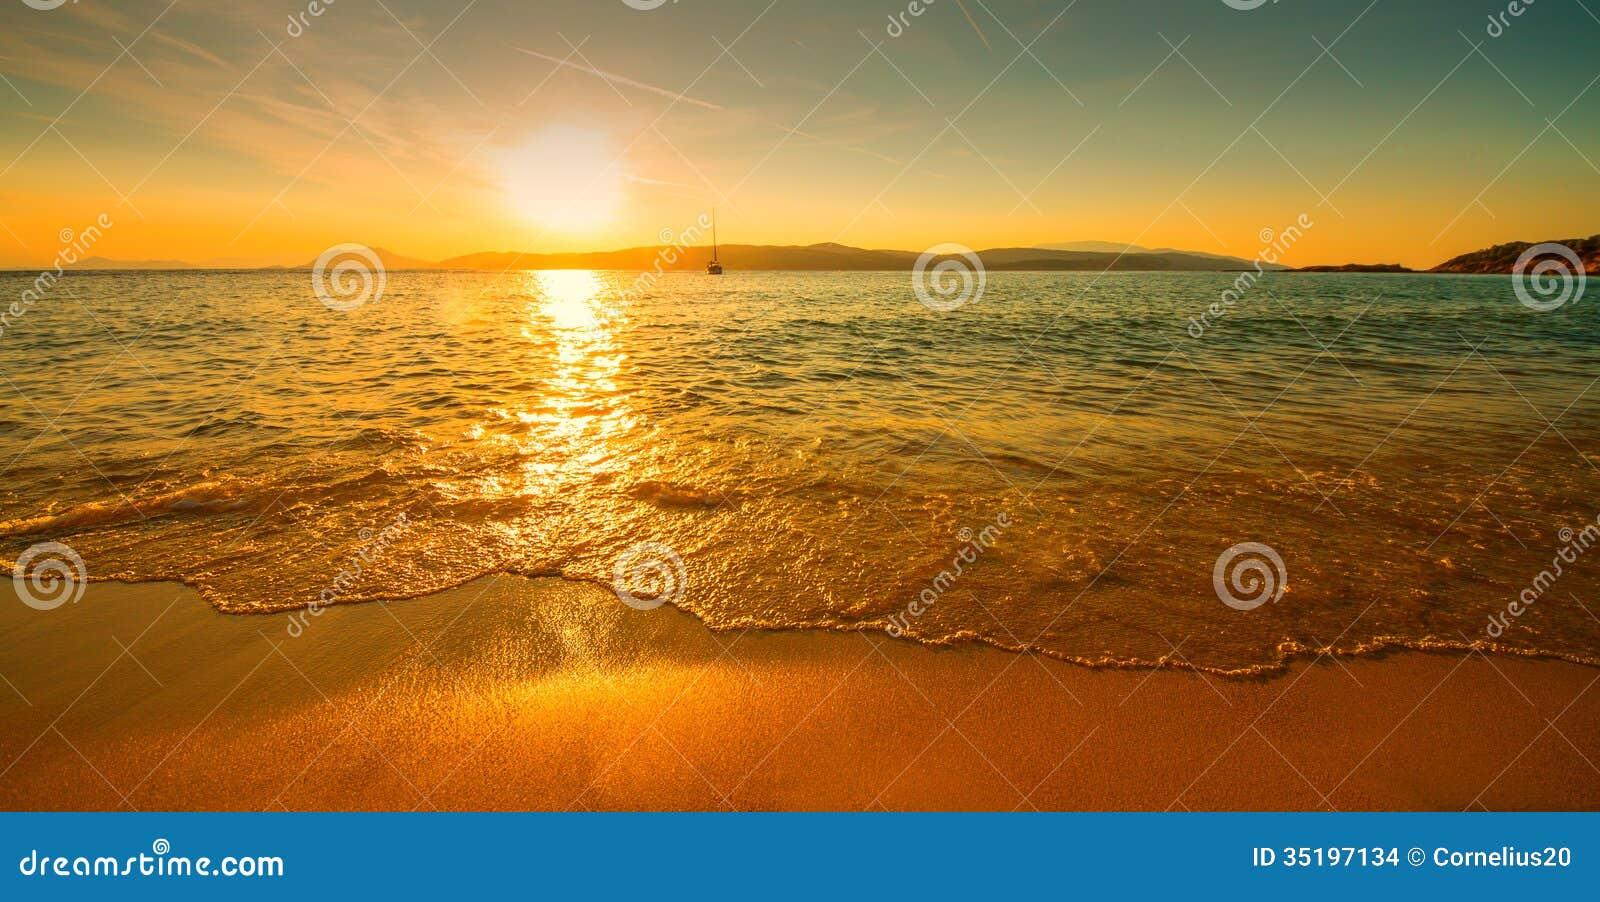 Sunset sunny beach